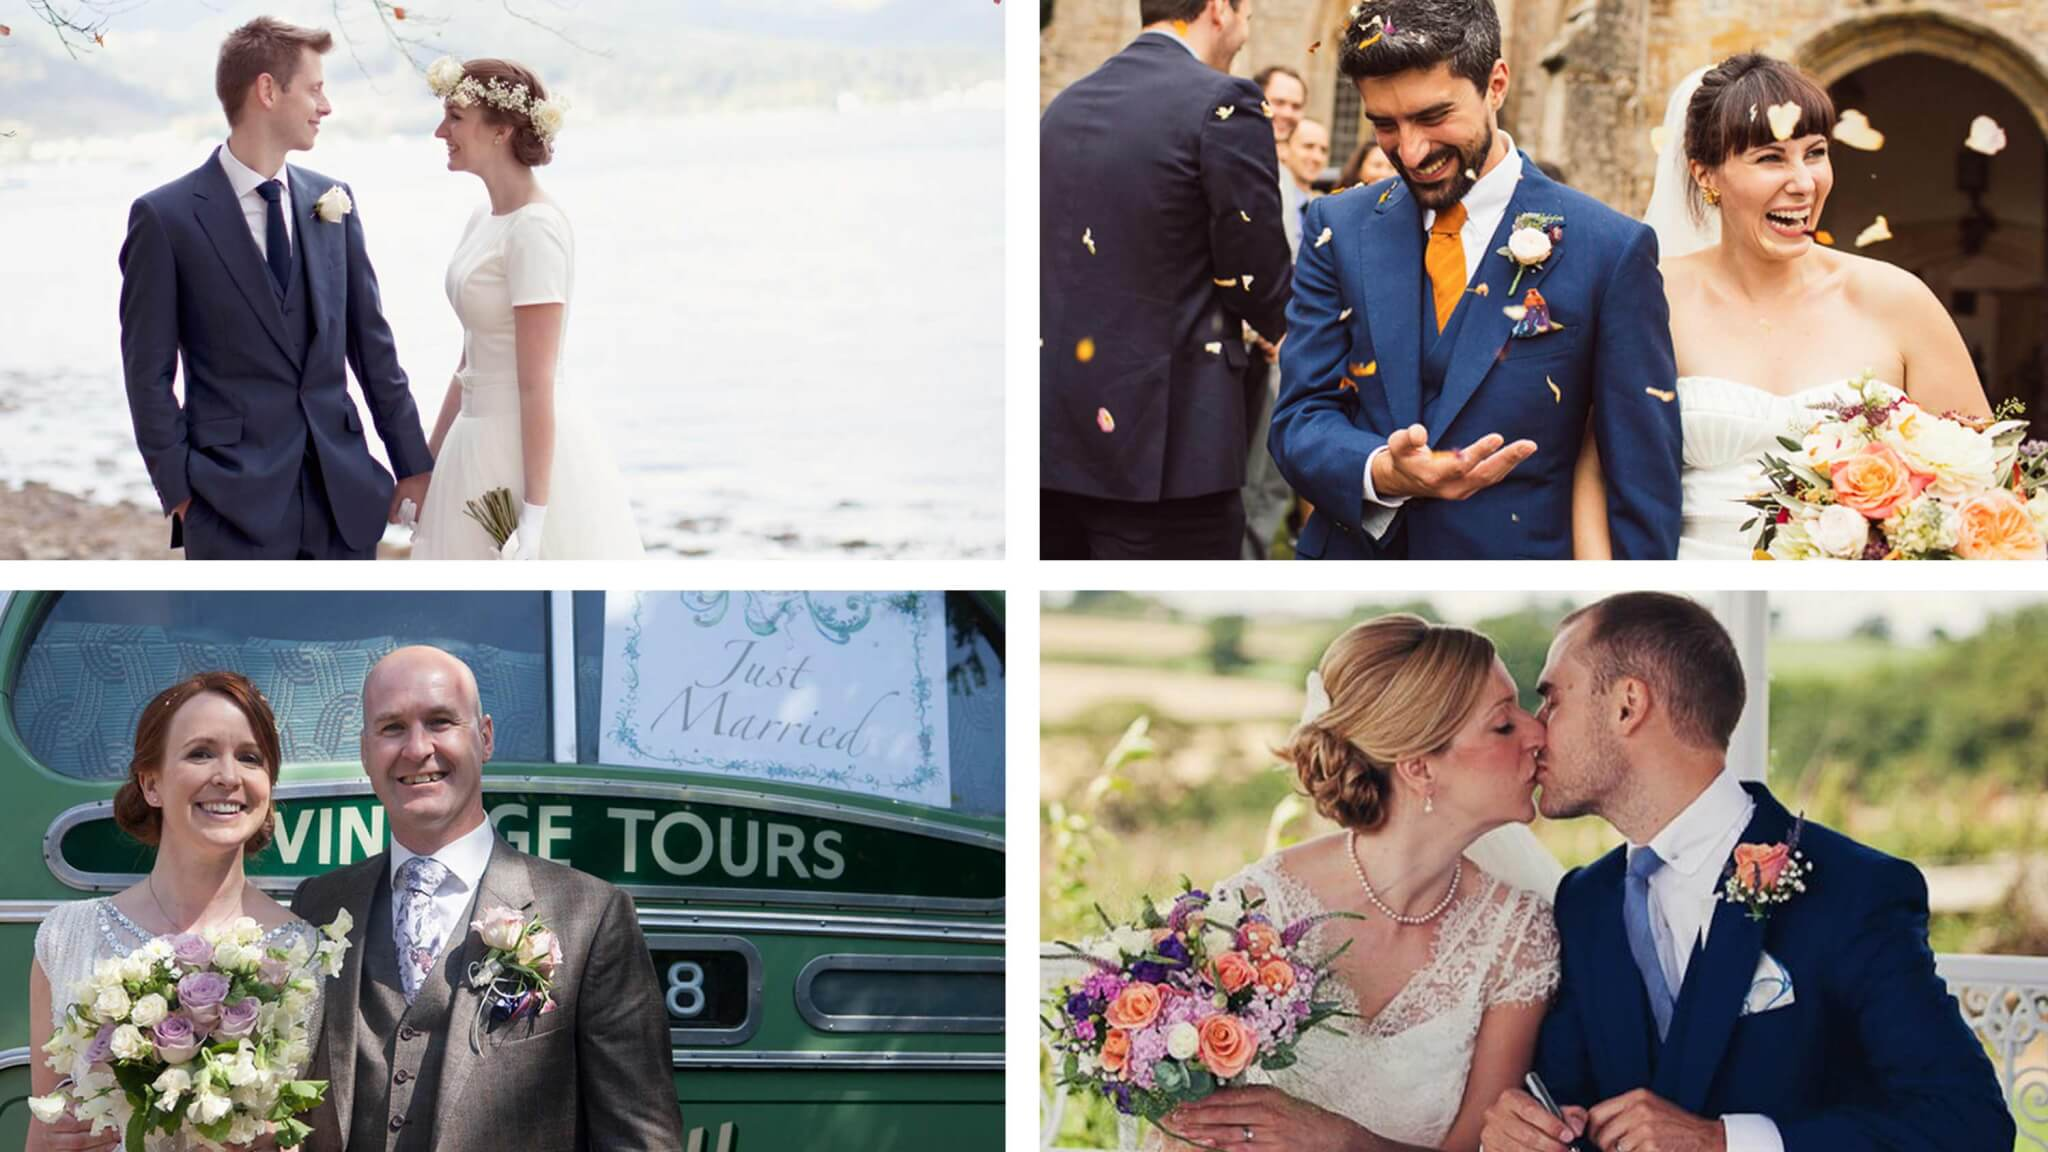 Bespoke Tailored Wedding Suits